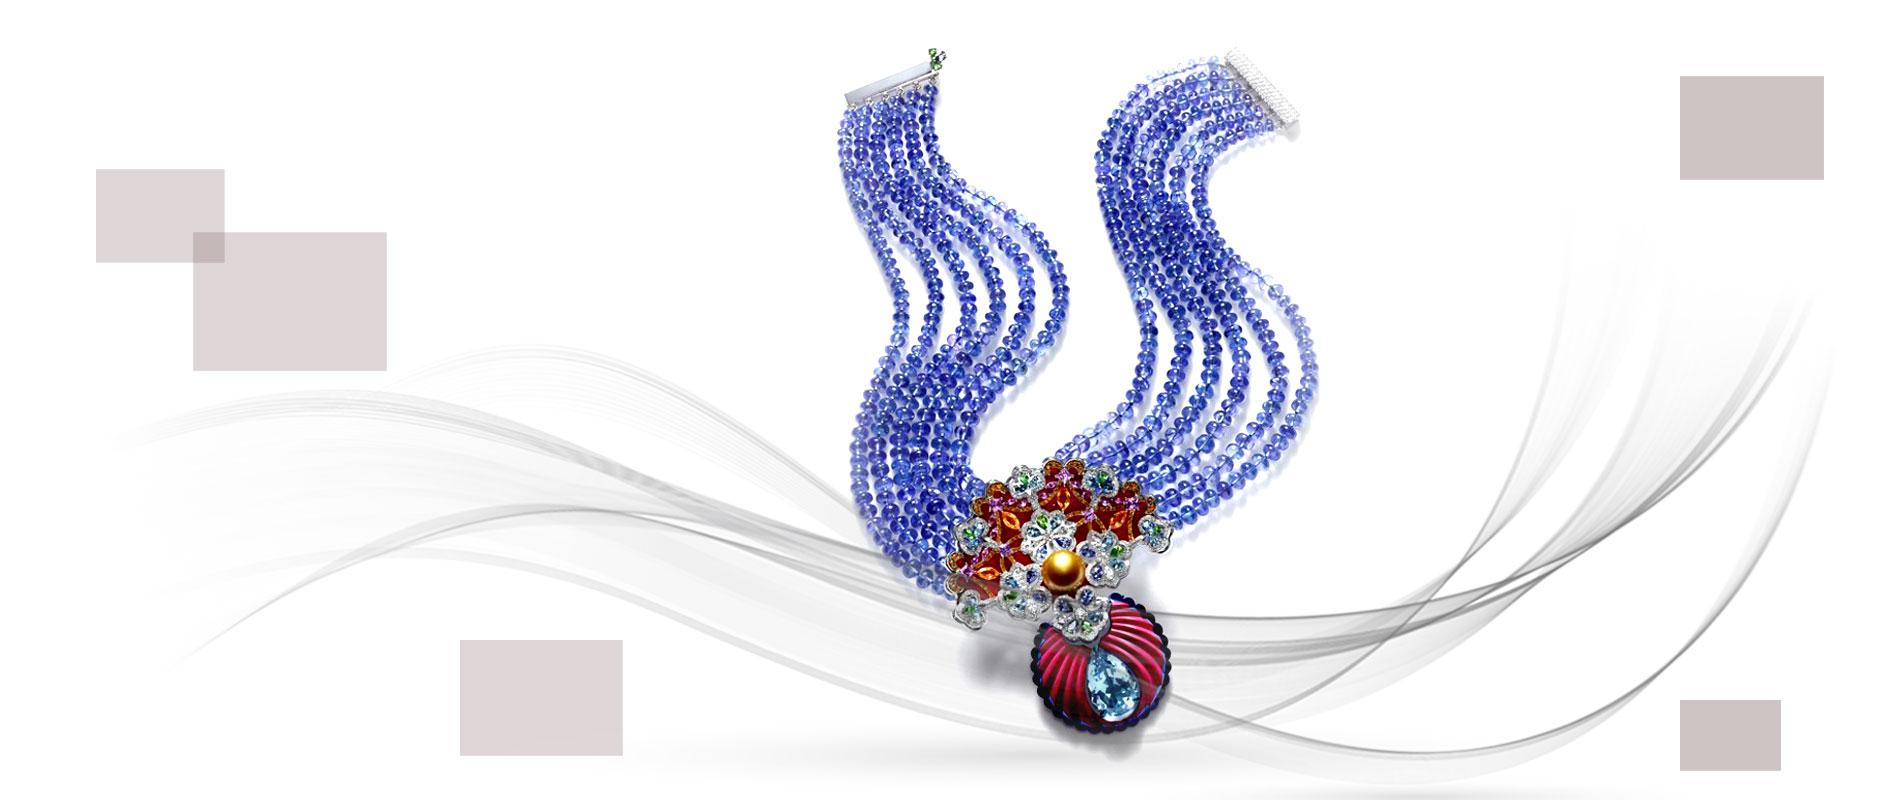 Jewellery designers 5 1 - استفاده از مواد اولیه غیر متعارف در جواهر سازی